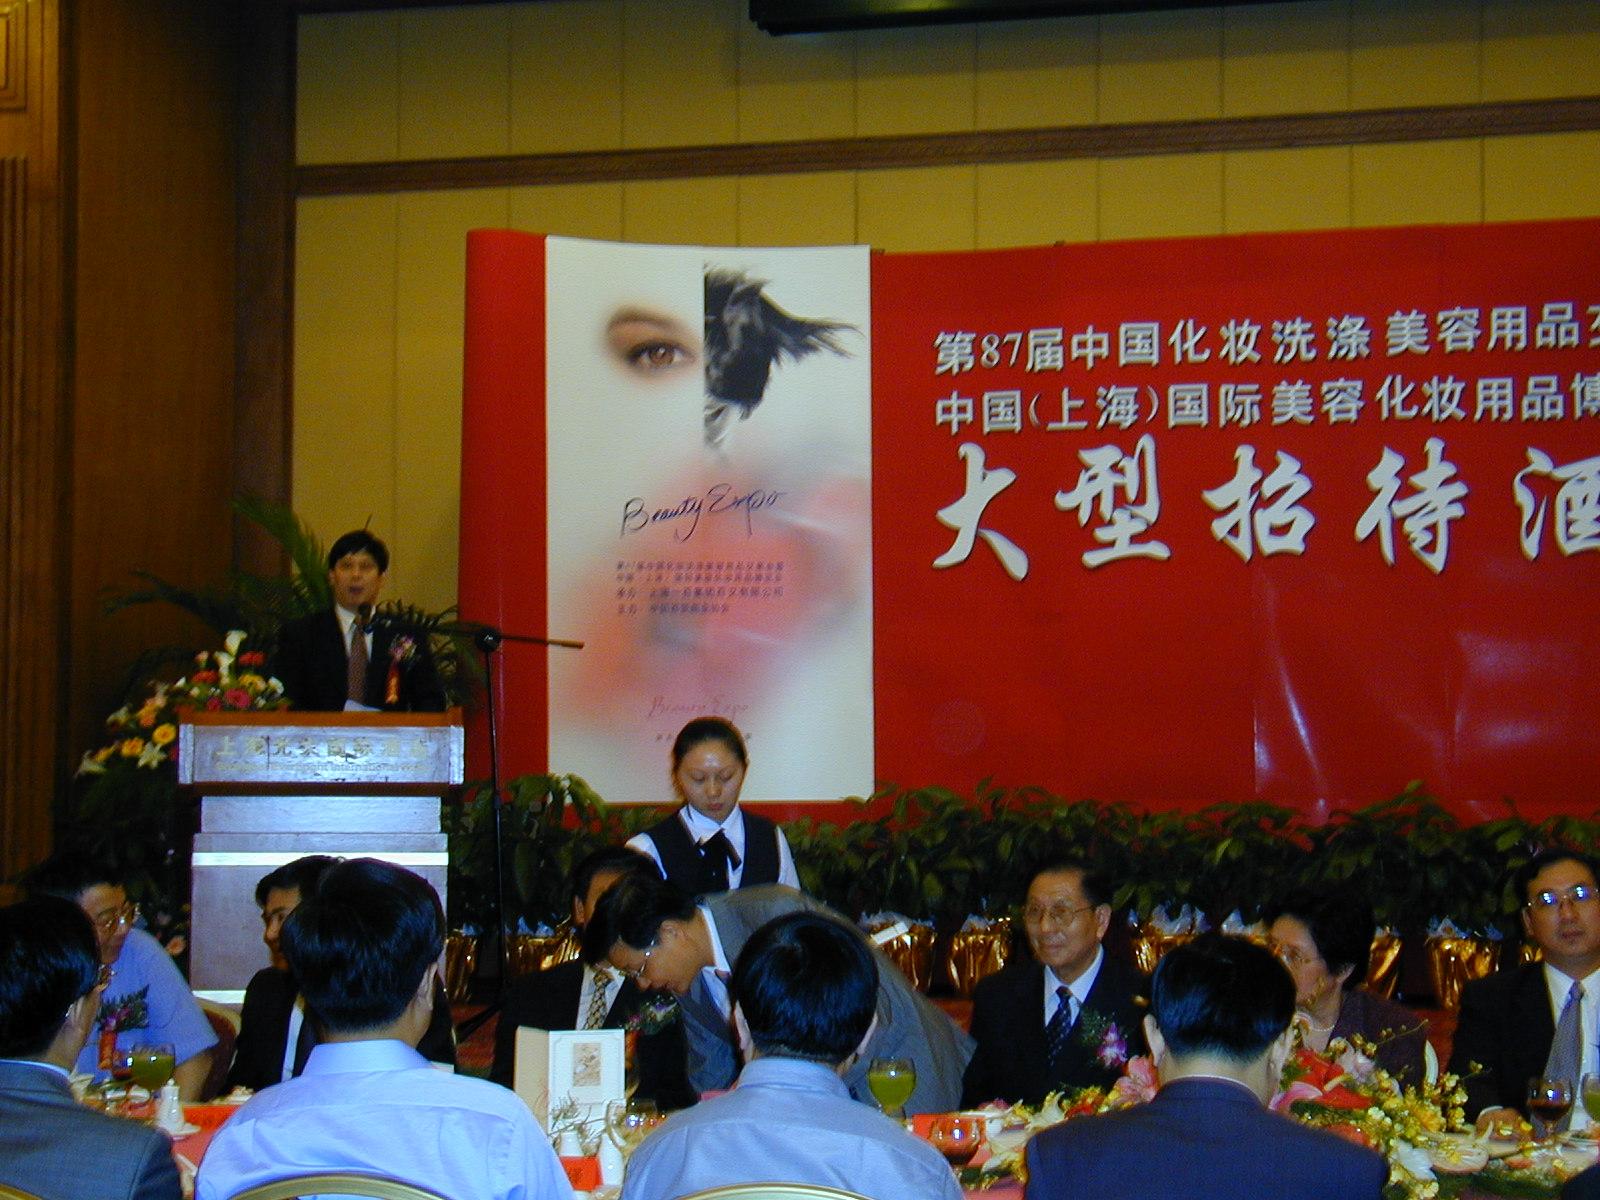 Shanghai Beauty International Expo 2000